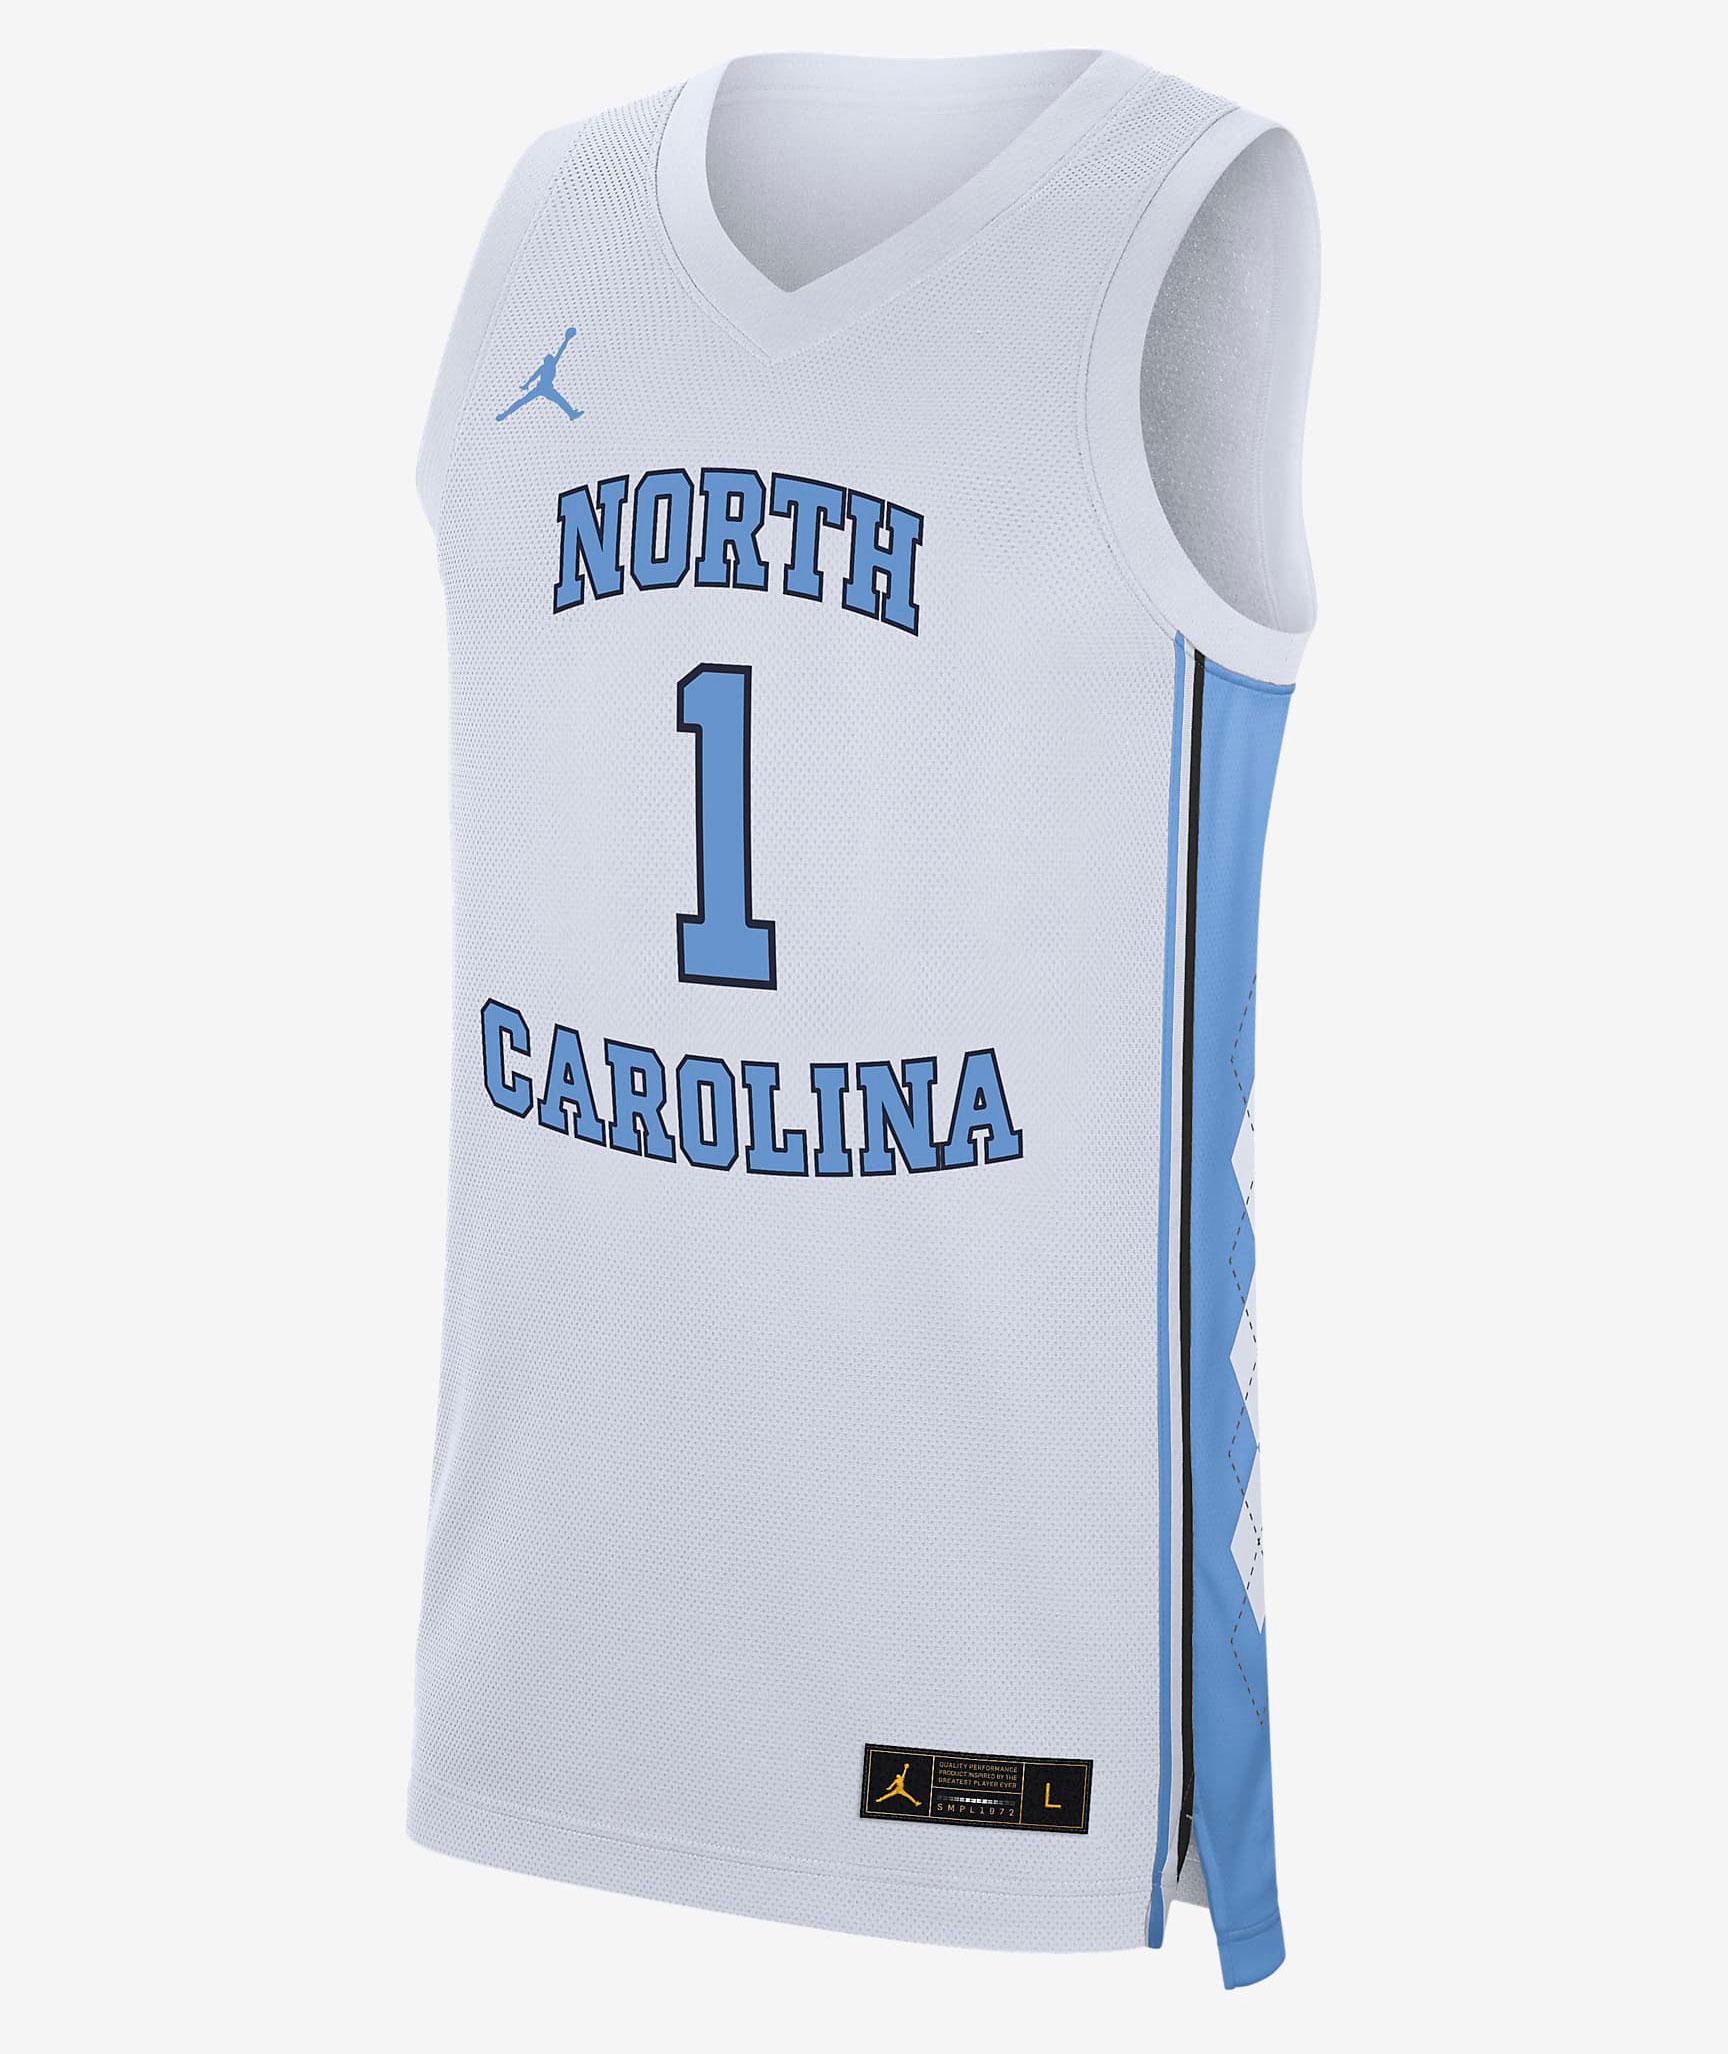 jordan-9-unc-north-carolina-basketball-jersey